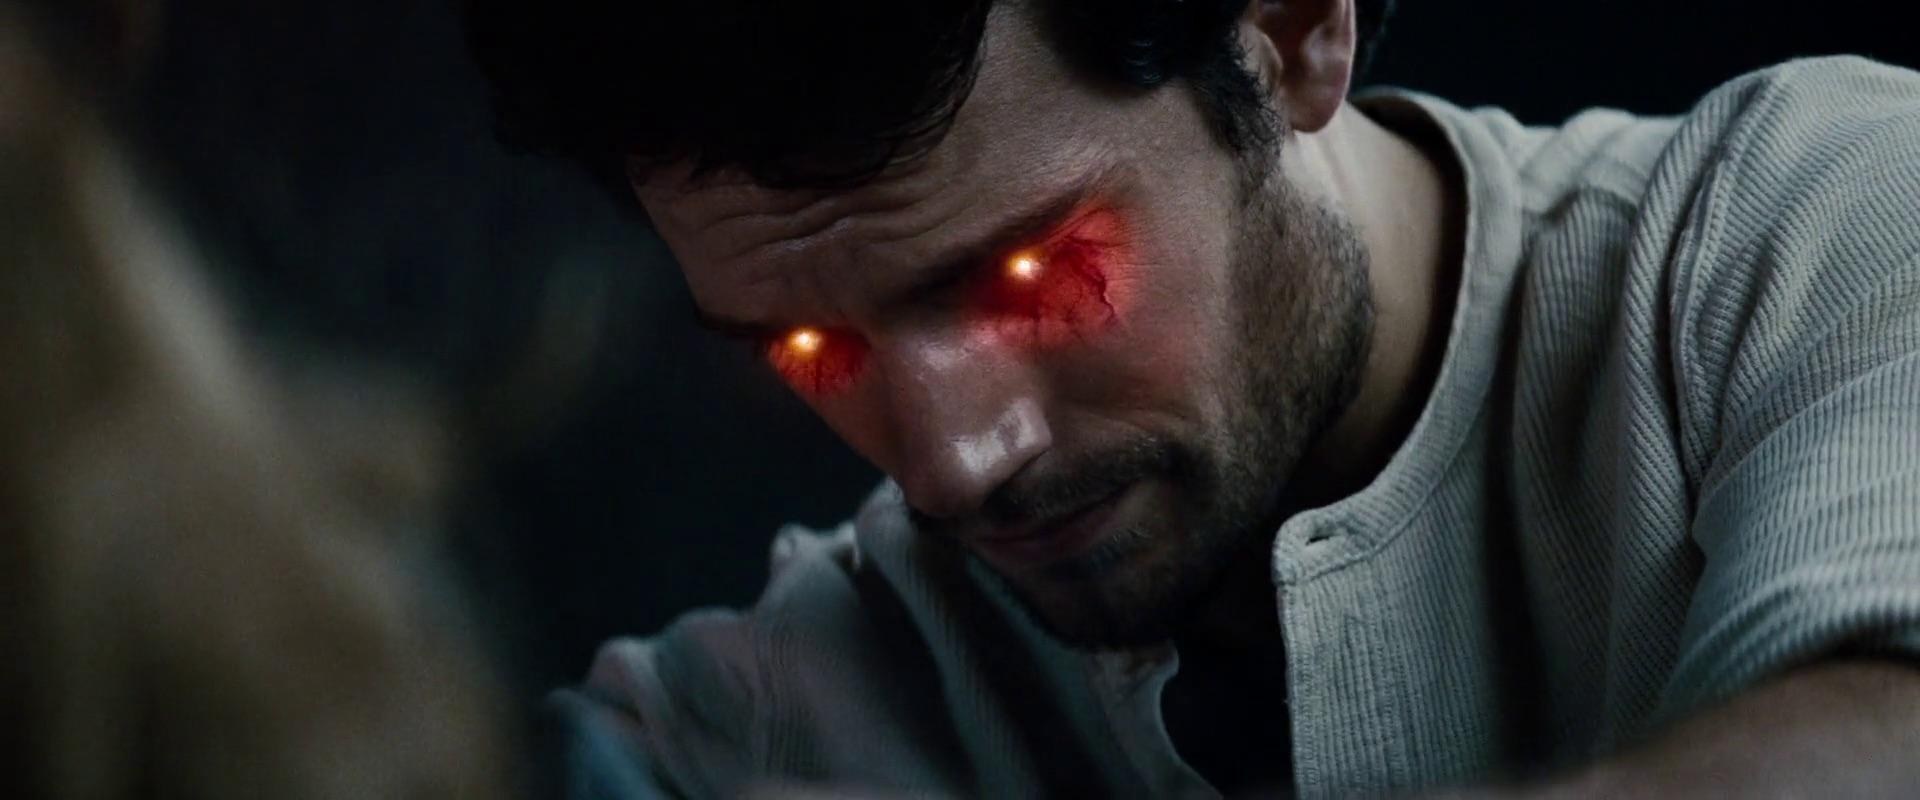 Clark using heat vision